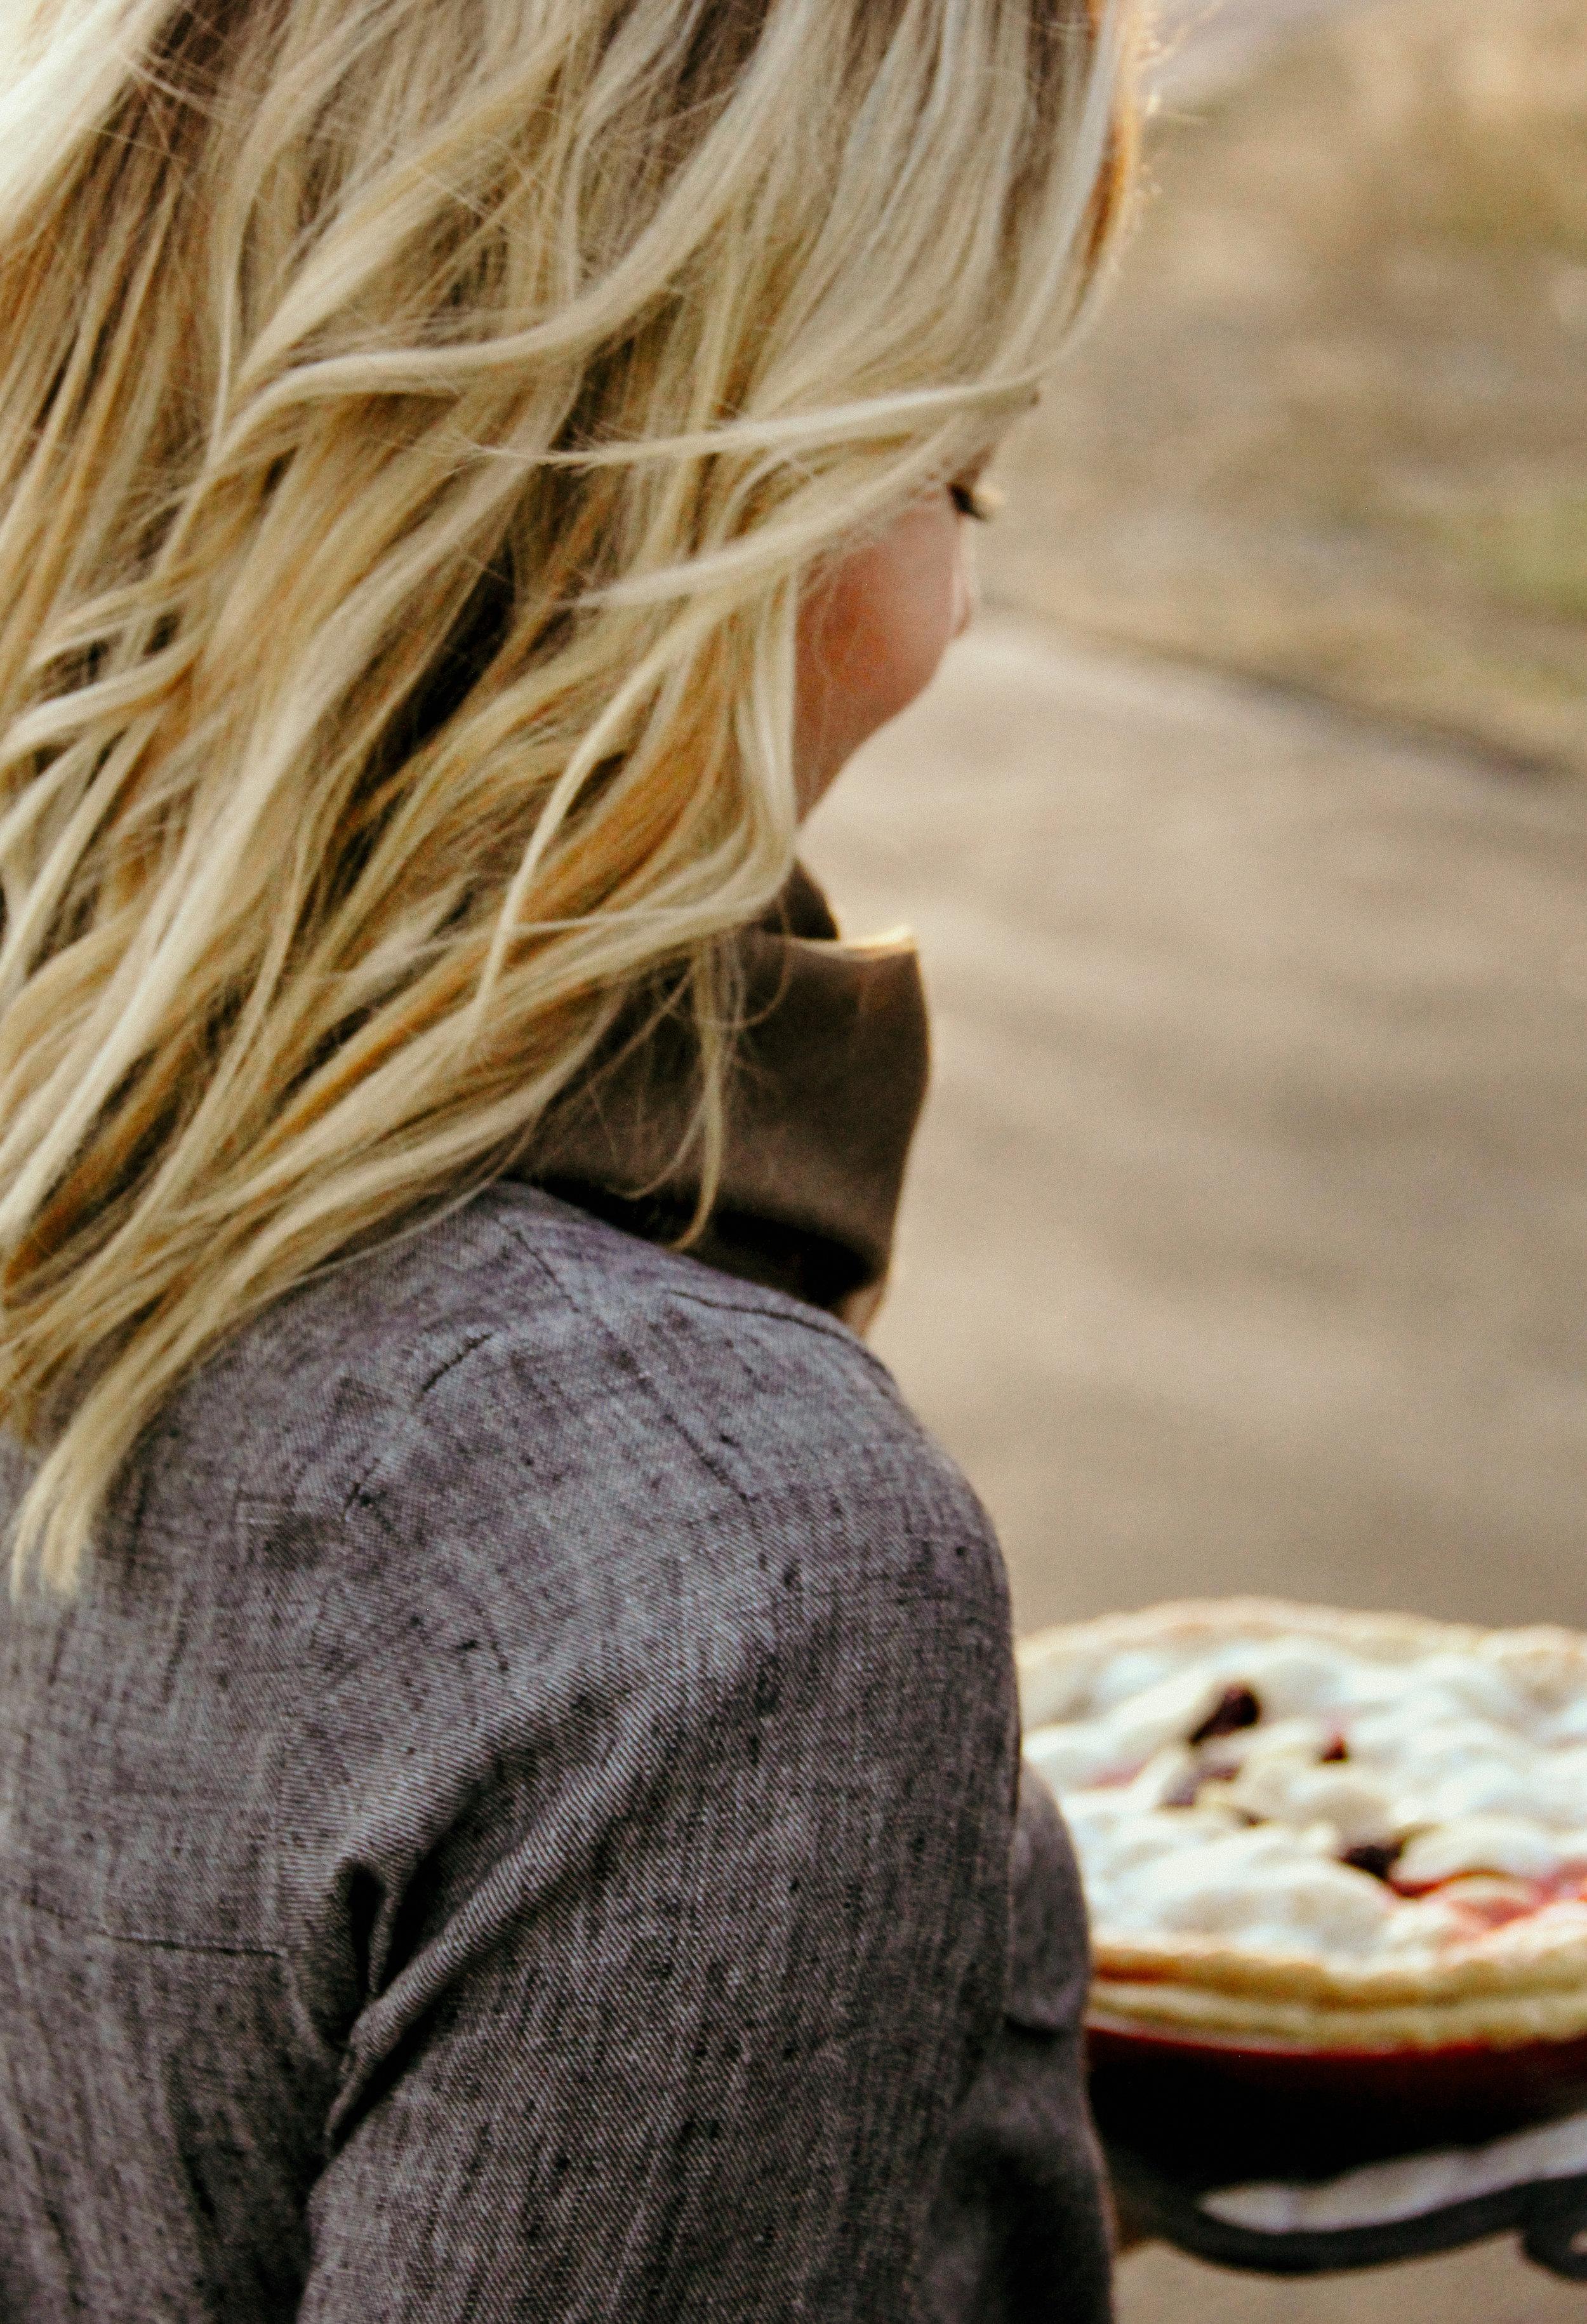 Handmade linen dress by Pyne & Smith Clothiers, California